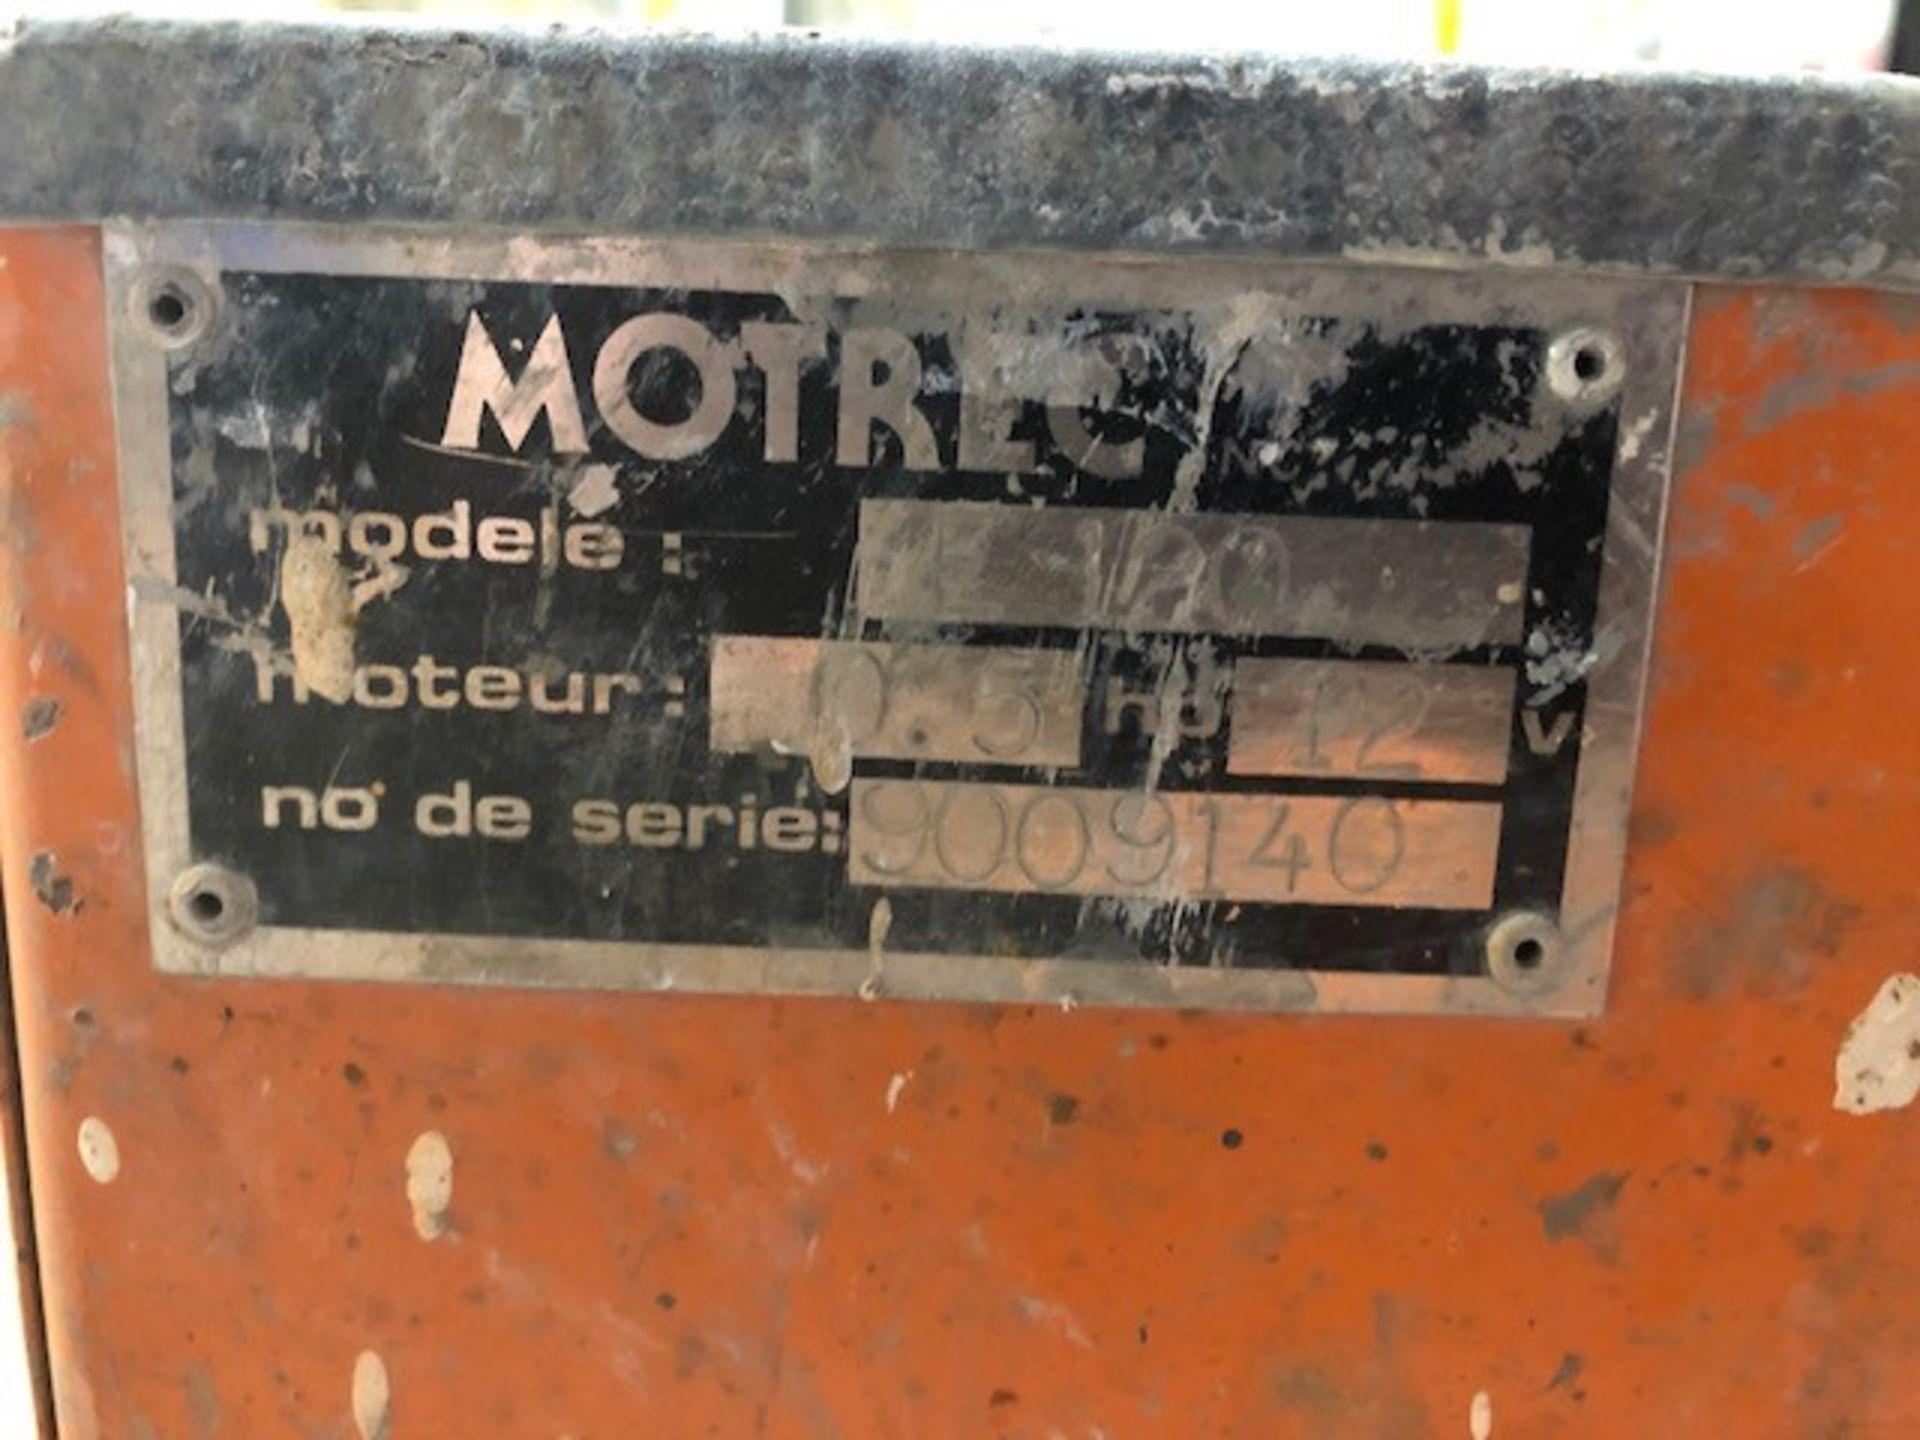 Lot 54 - Buggy Motrec, Model: E120, s/n: 9009140 (#233)